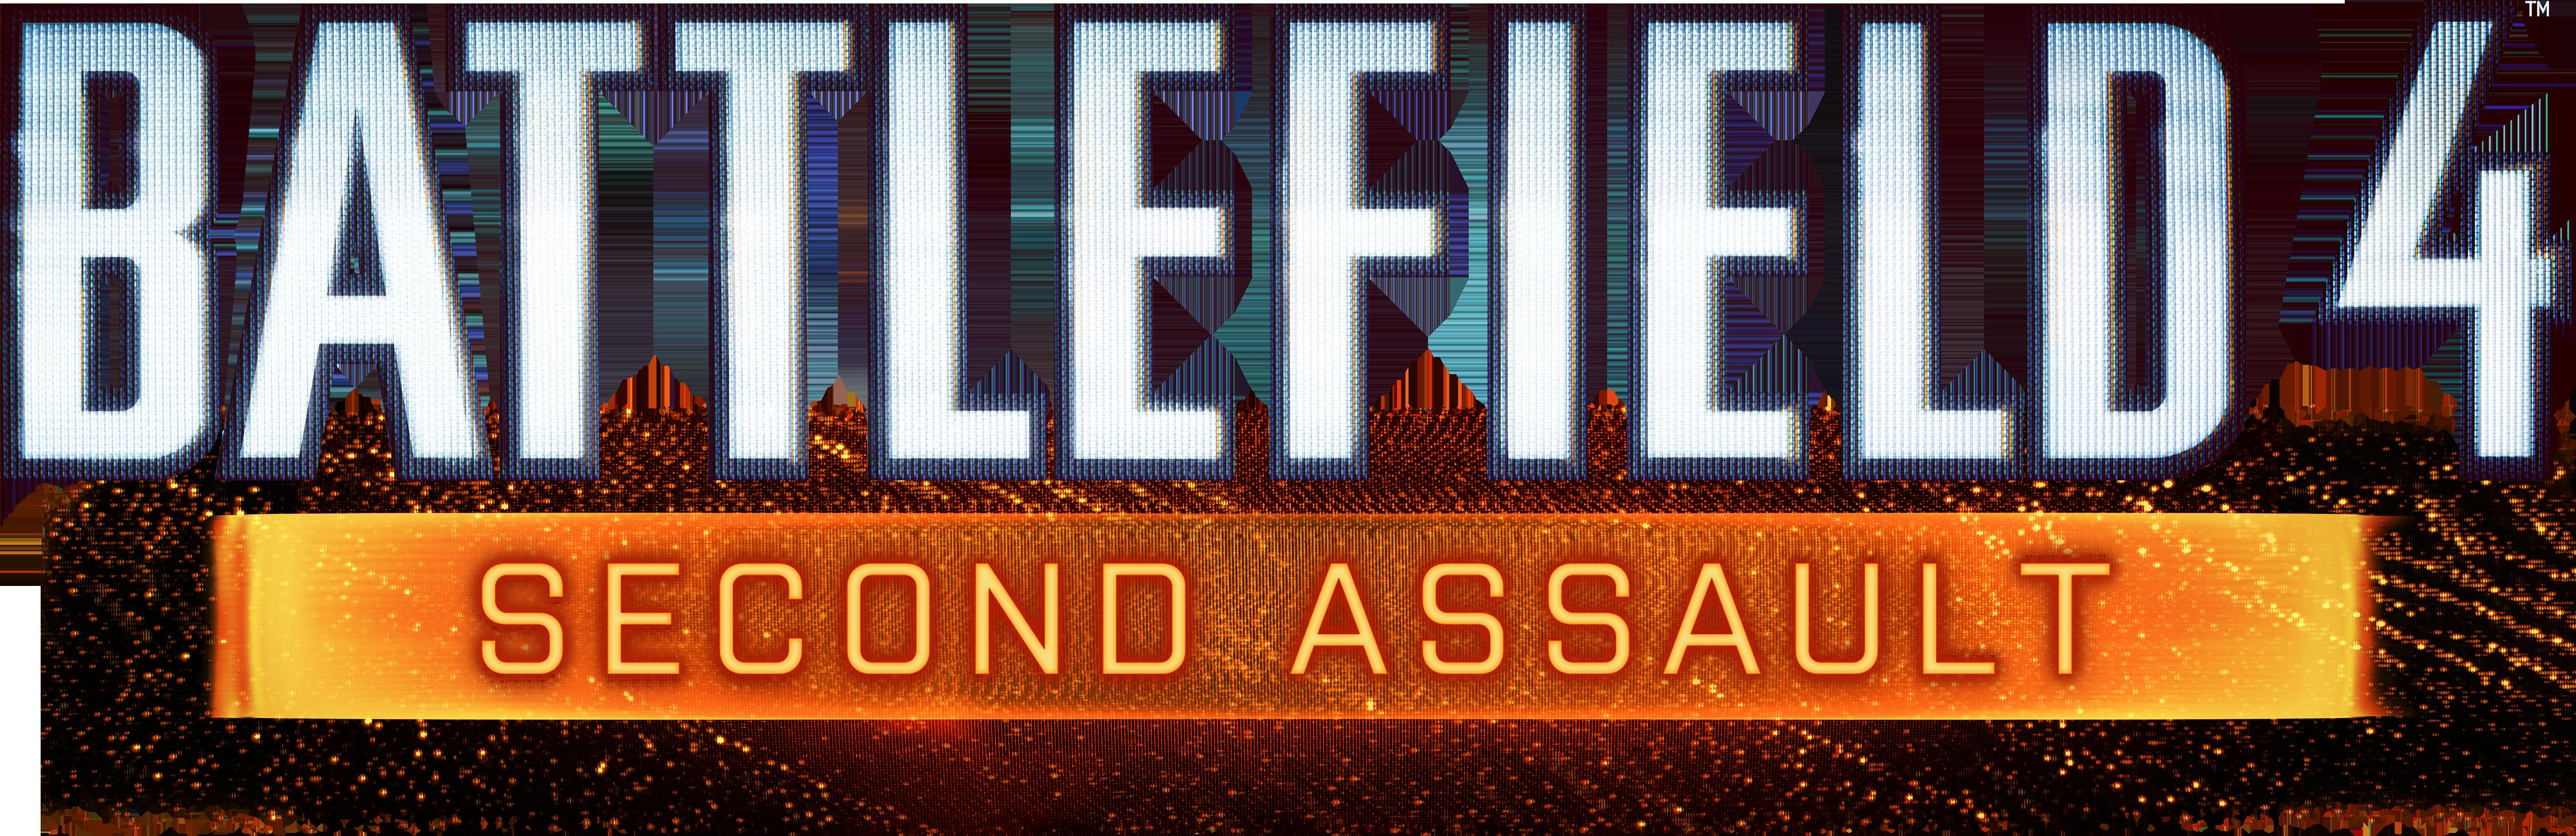 HD Battlefield Logo Png Page.